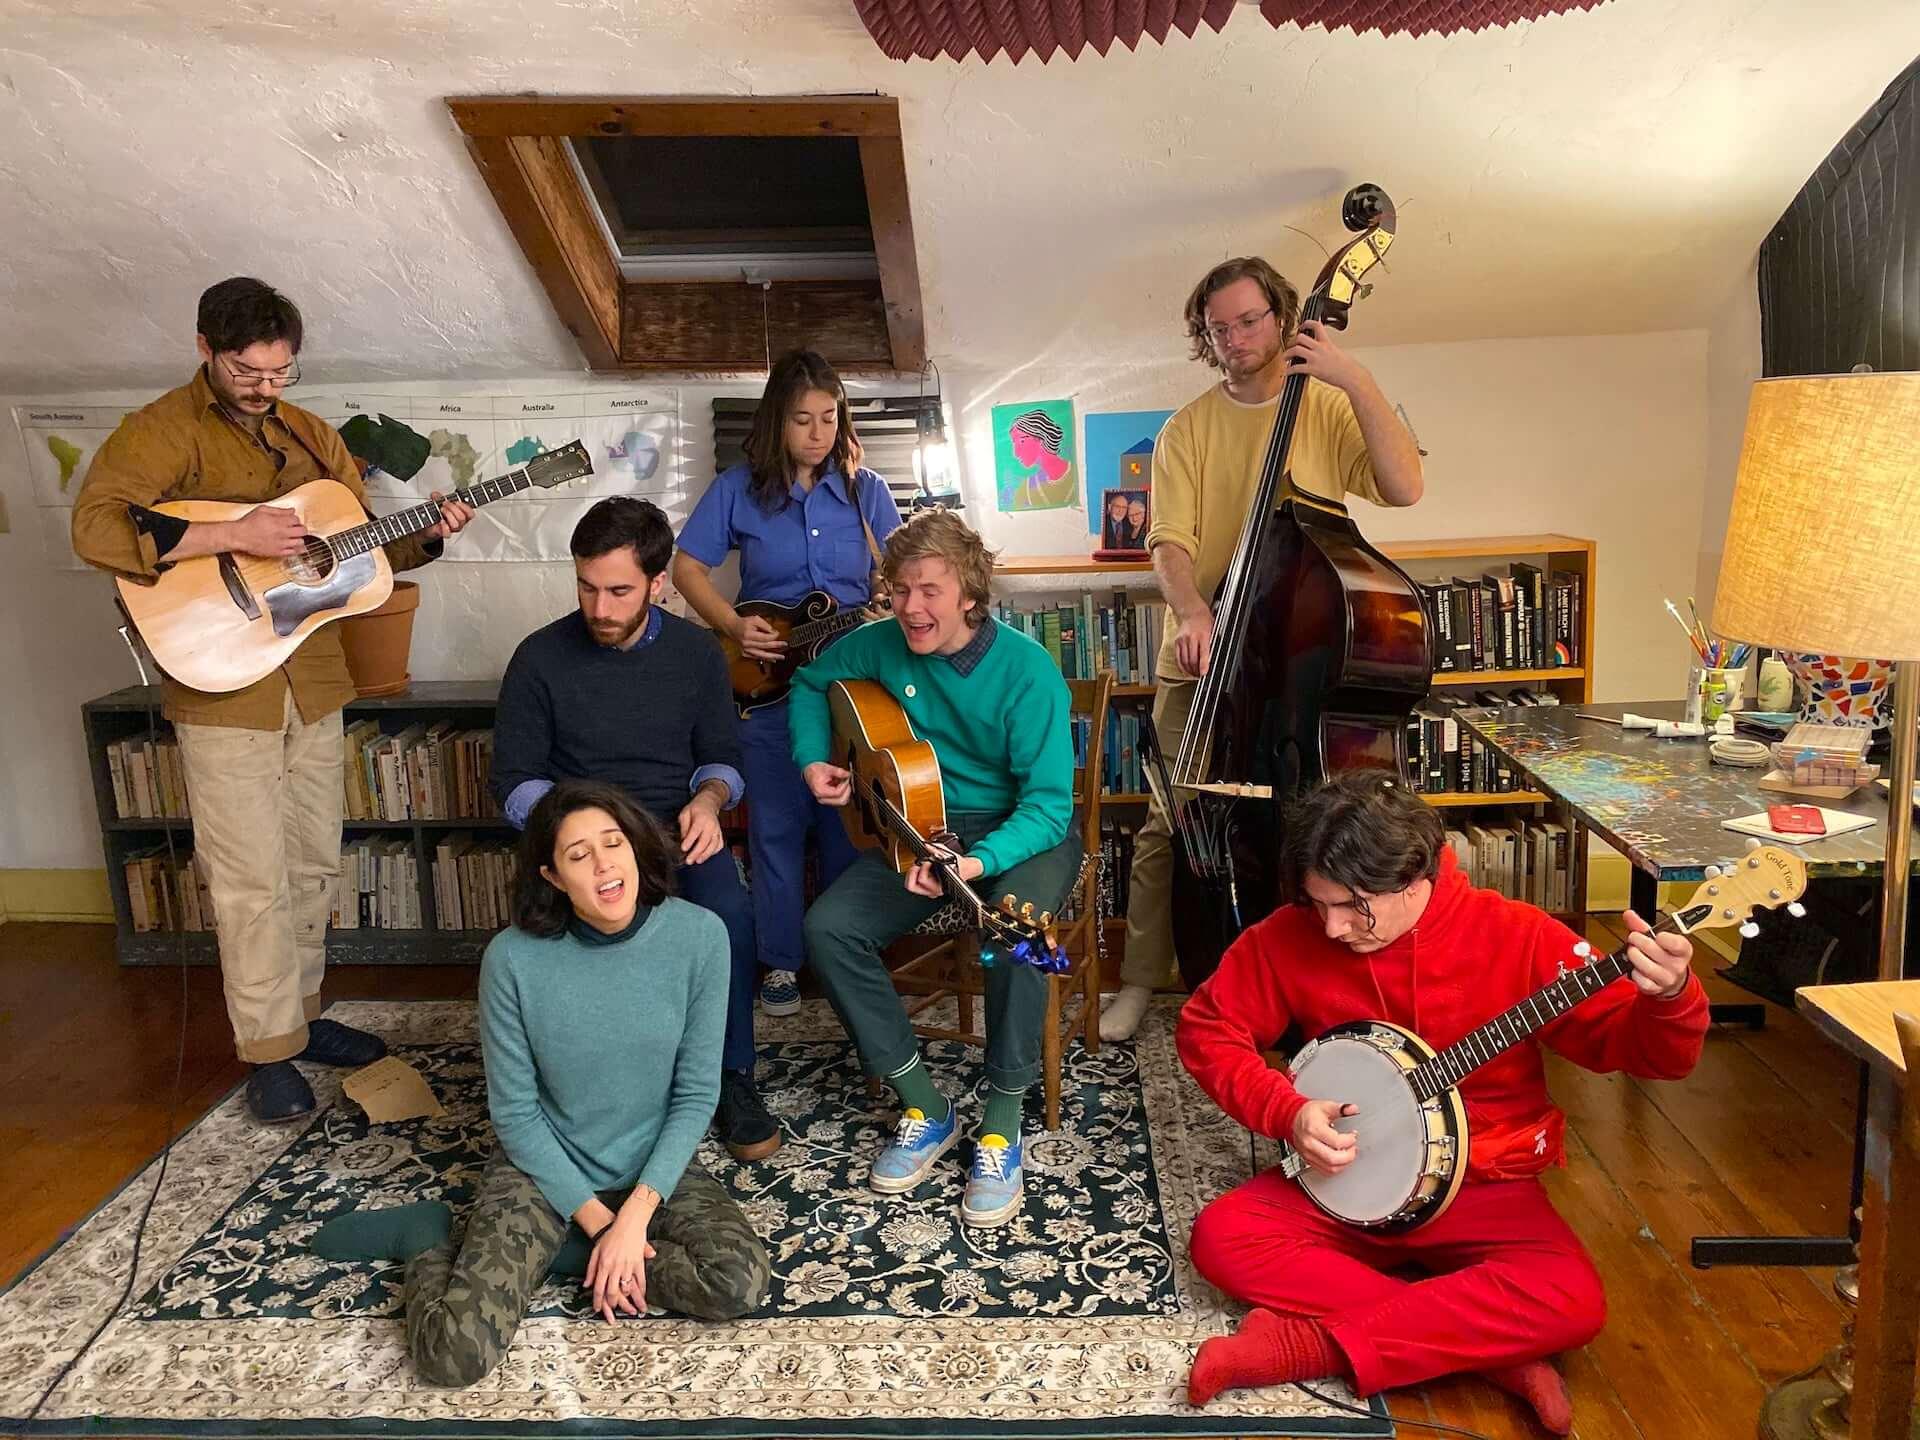 Pinegrove初のスタジオ・ライブ・ベスト盤『Amperland, NY』が発売決定!Half Waifとして知られるNandi Roseもフィーチャー music201204_pinegrove_1-1920x1440